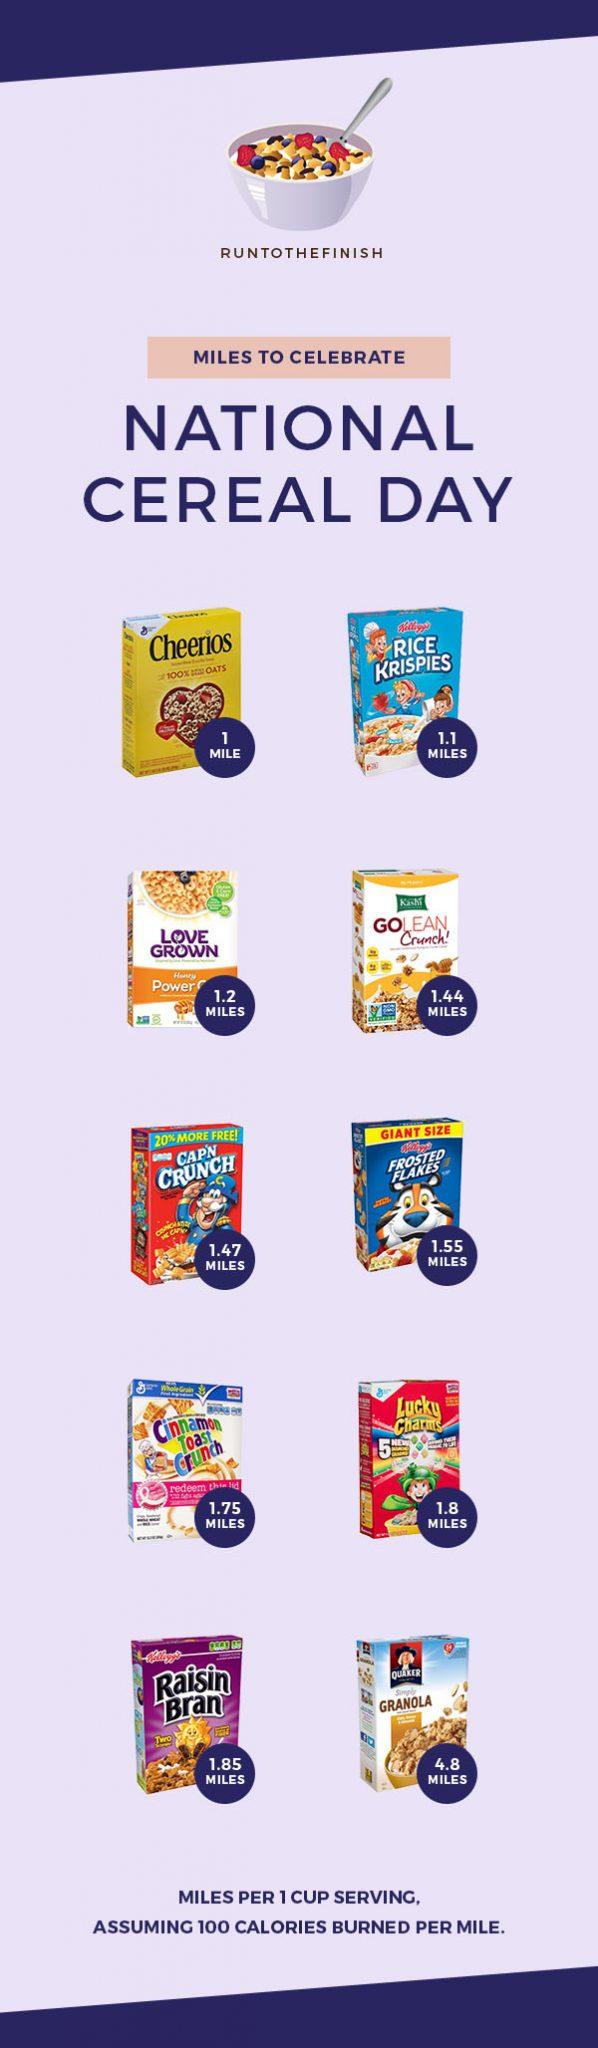 miles per cereal